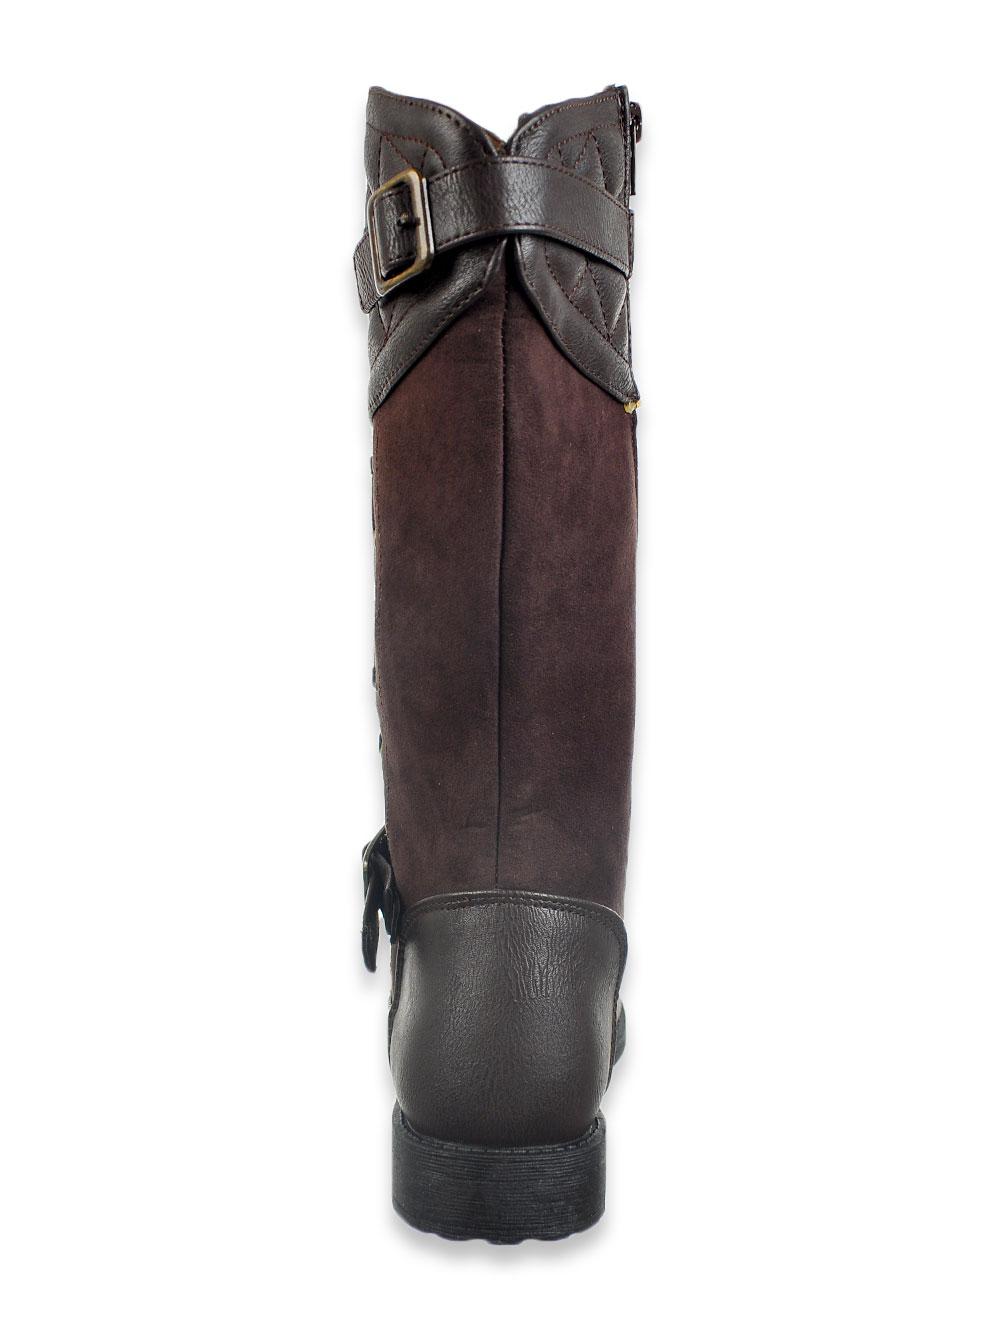 Rachel Girls/' Heart Buckle Strap Sandals Sizes 6-4